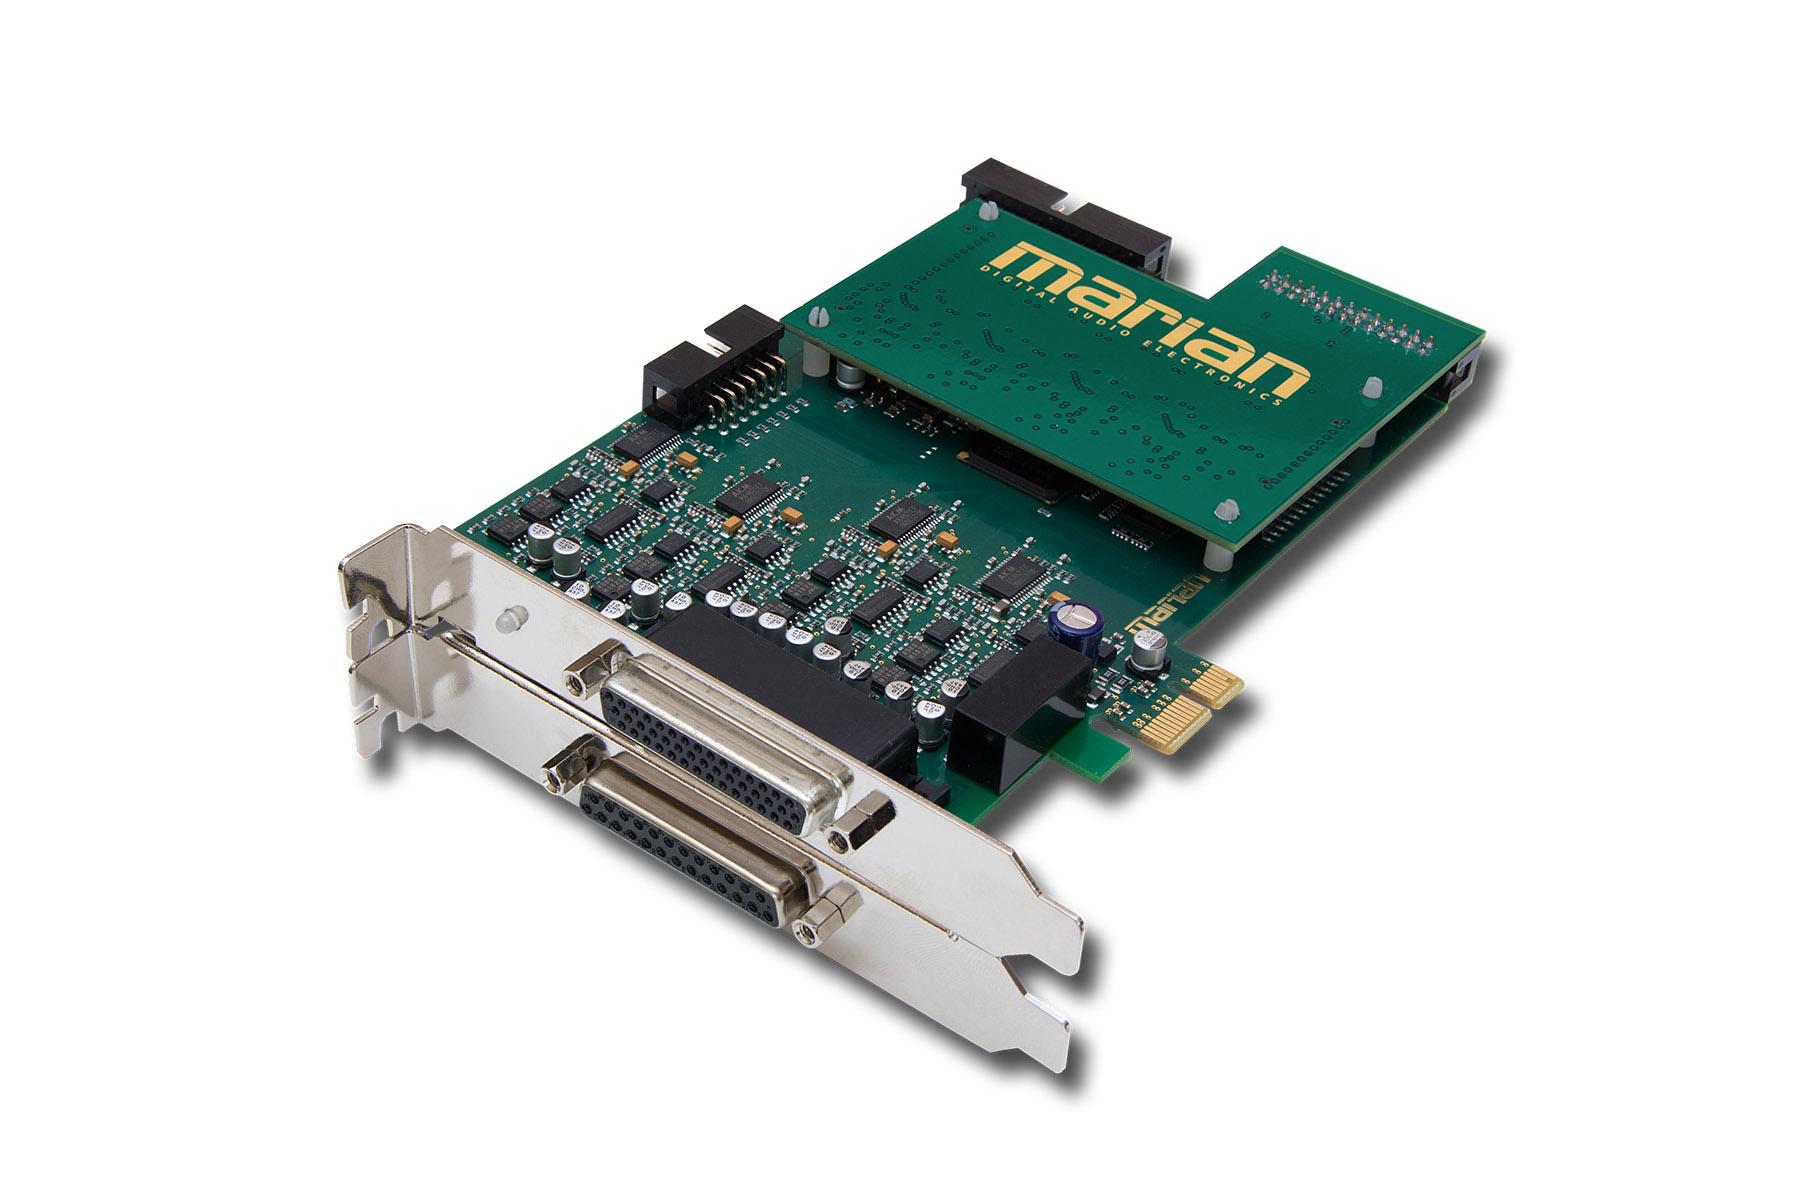 News: Marian präsentiert PCIe-Audiokarten Seraph AD8 und Seraph D8-C